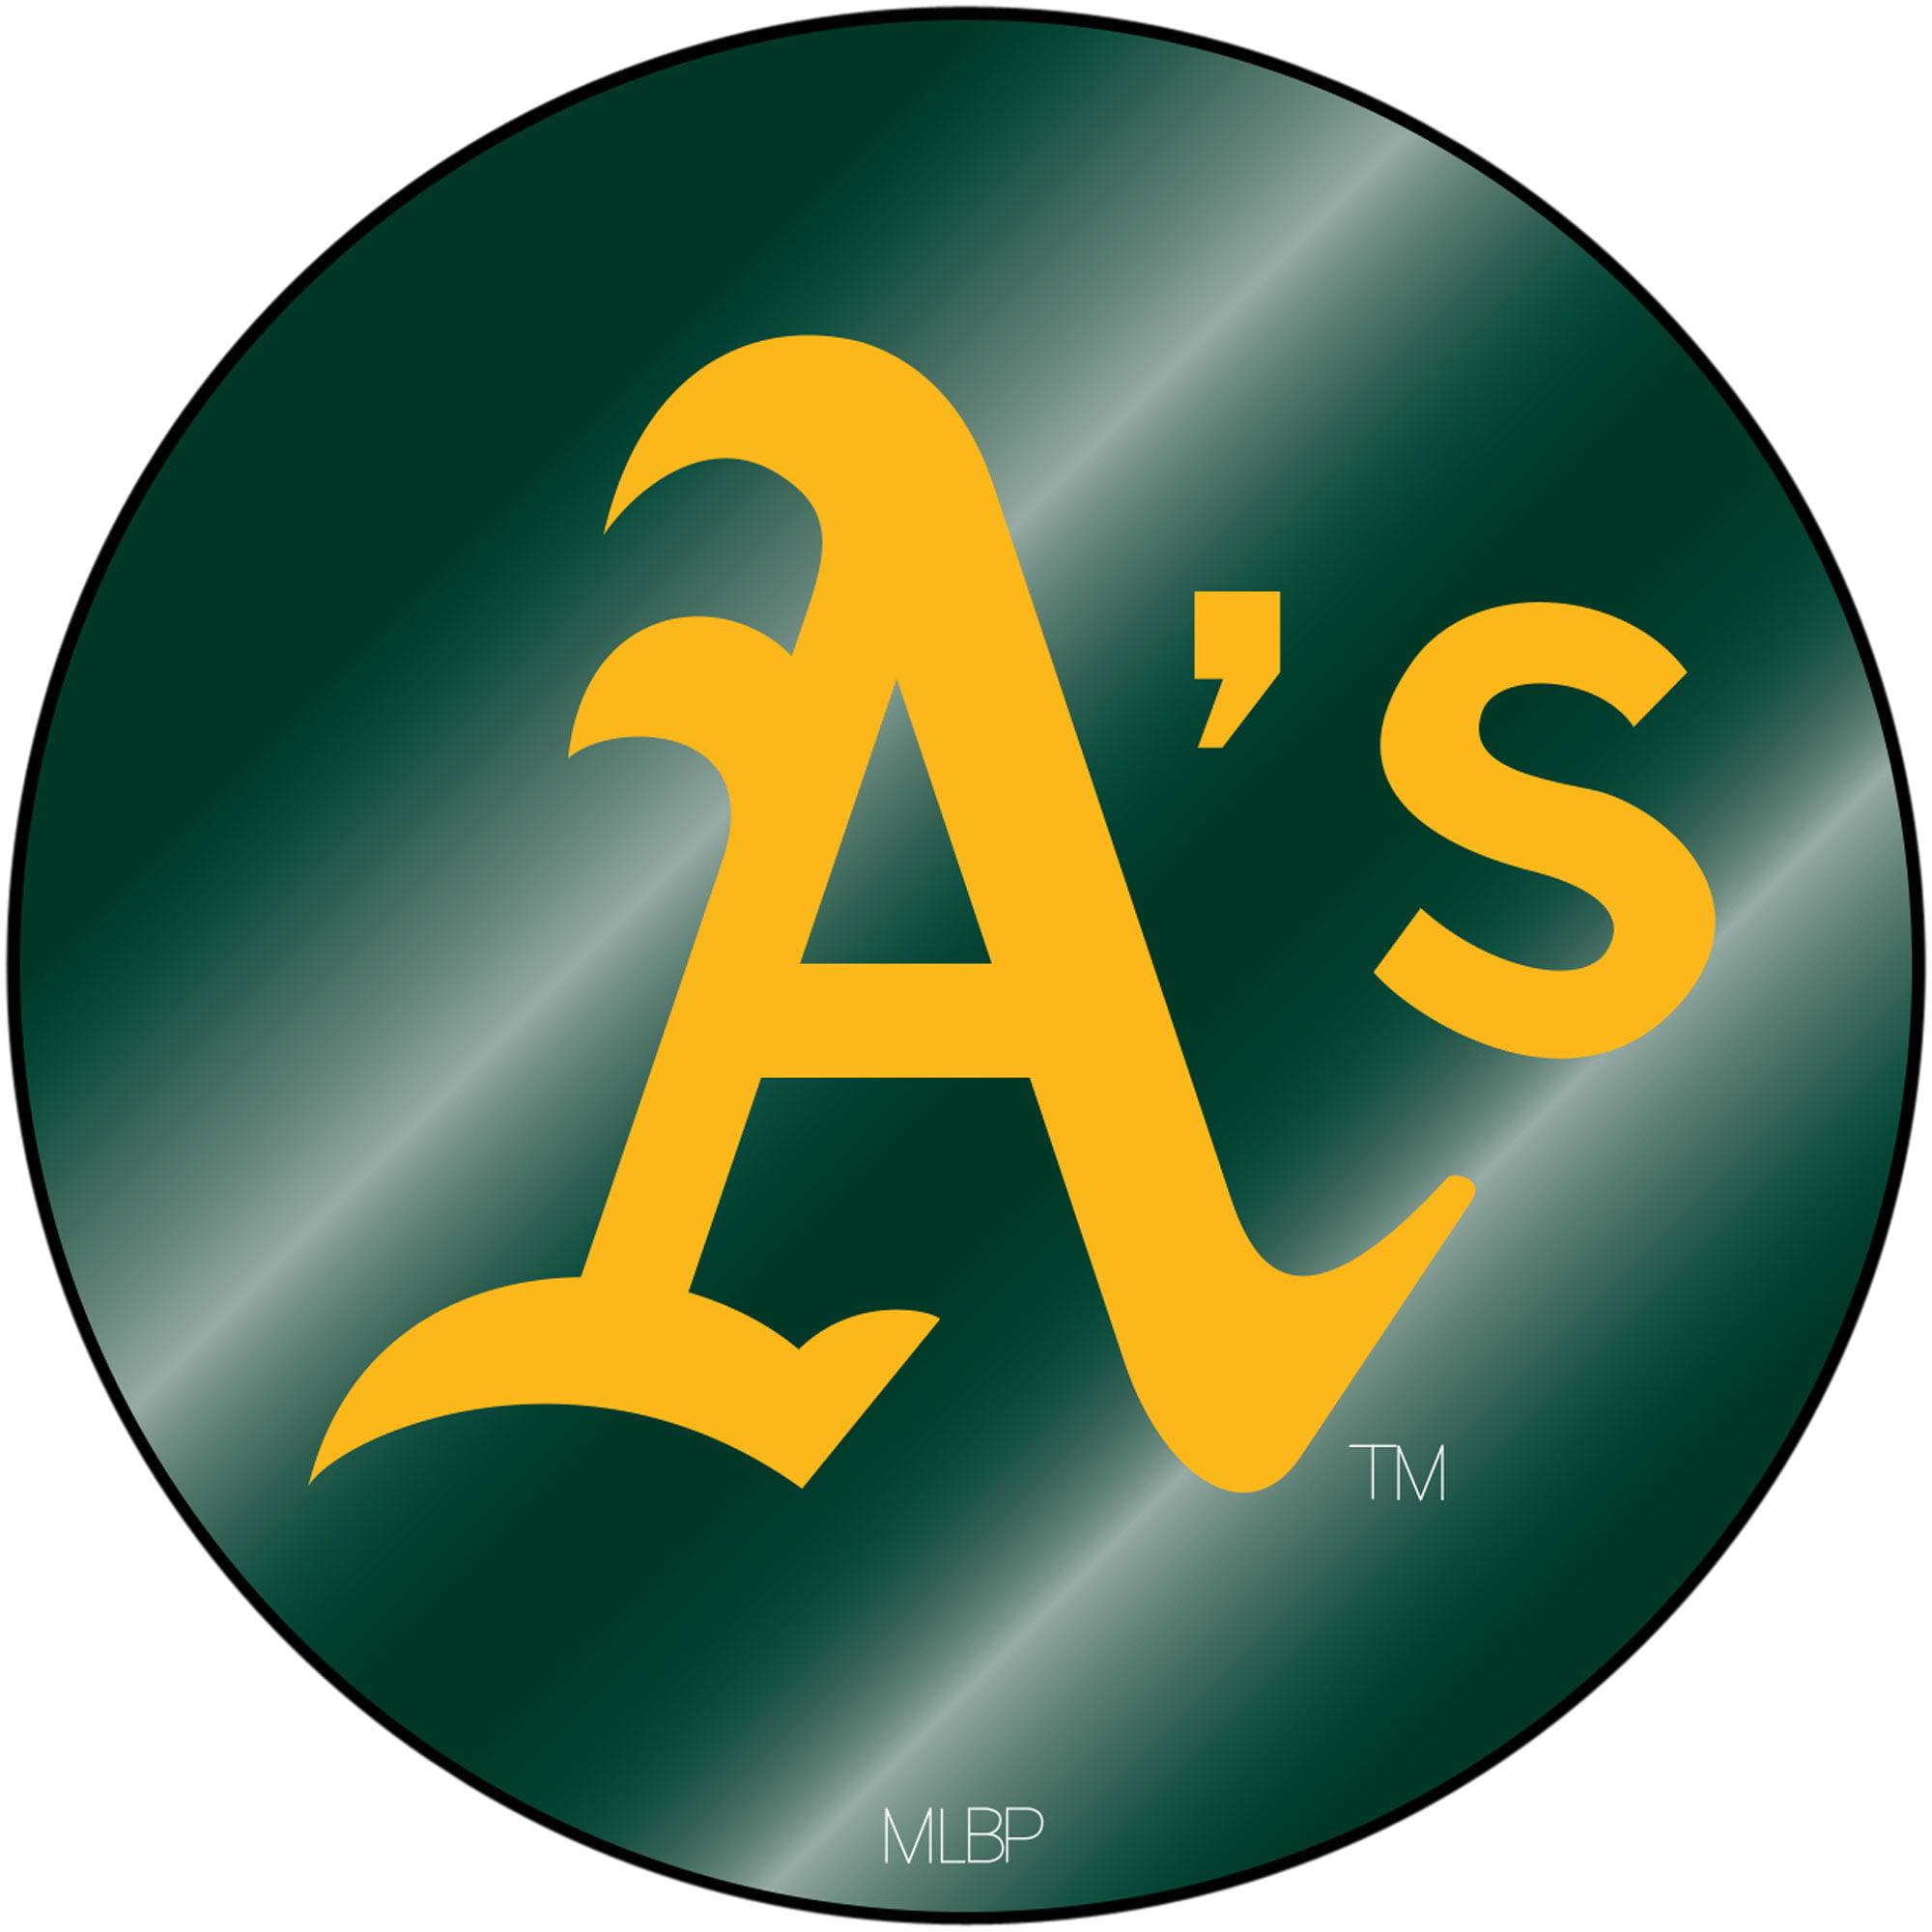 Oakland Athletics Sparo Laser Discus Decal - No Size